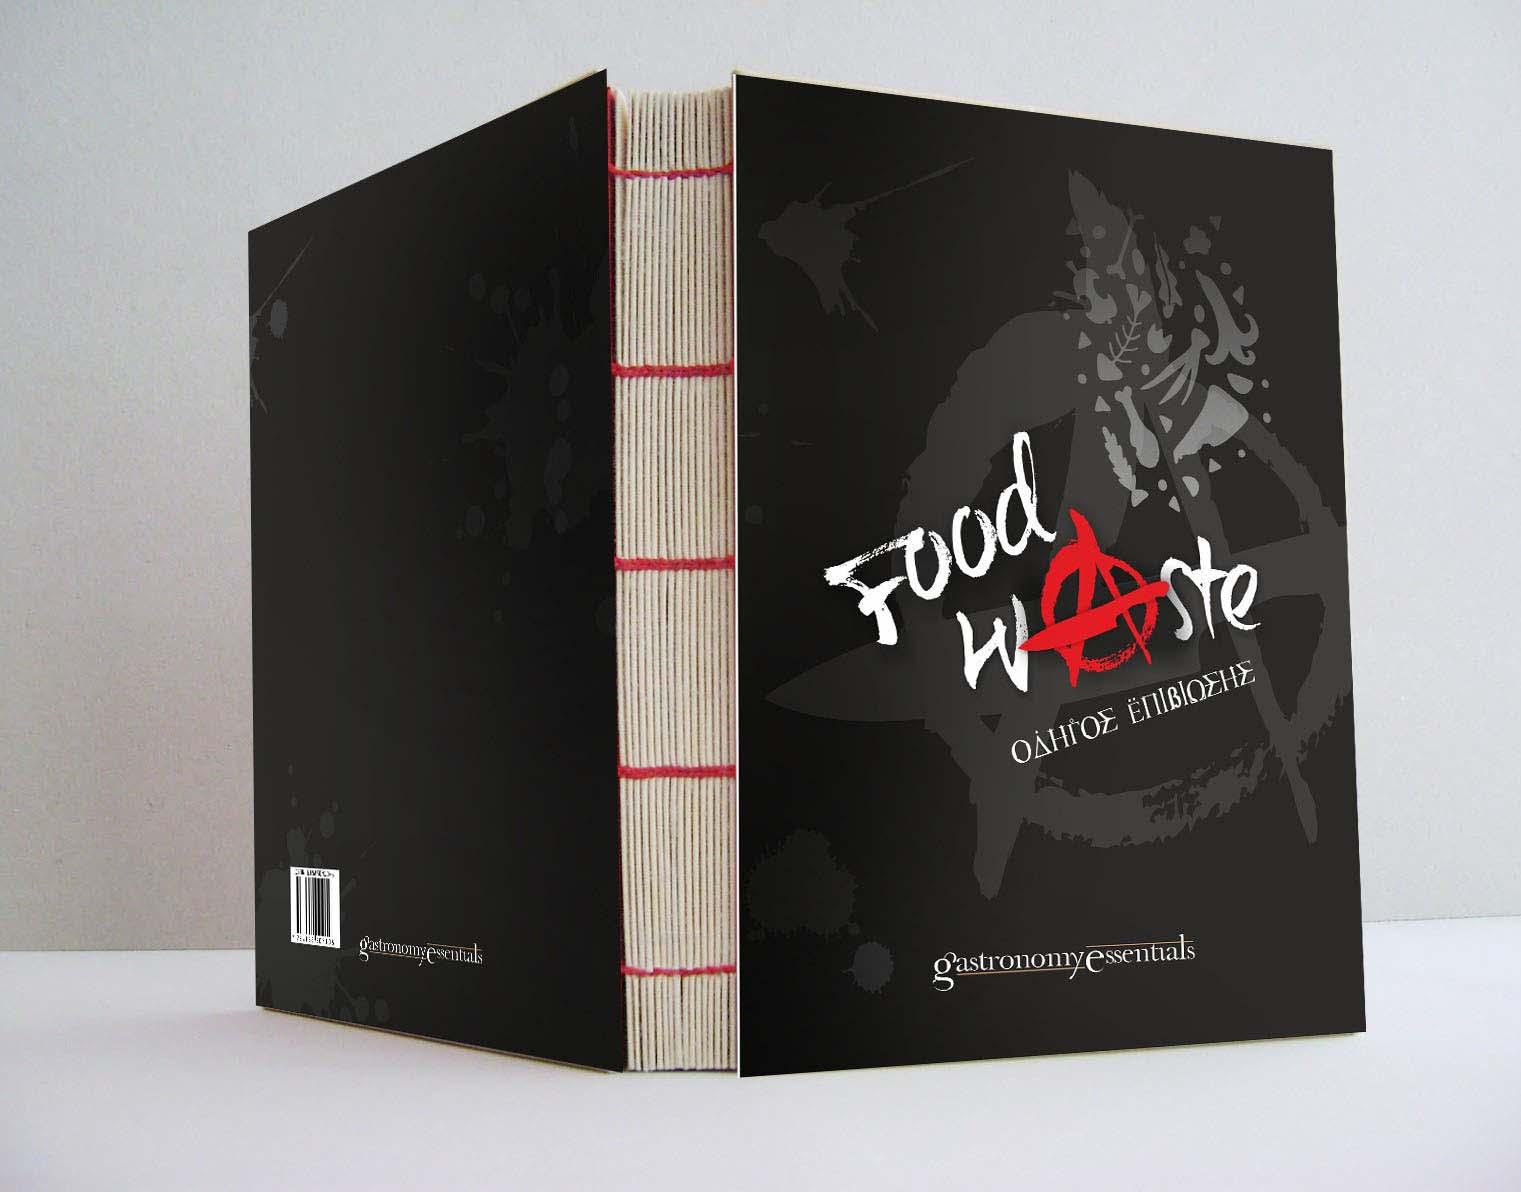 3 Food Waste open back book